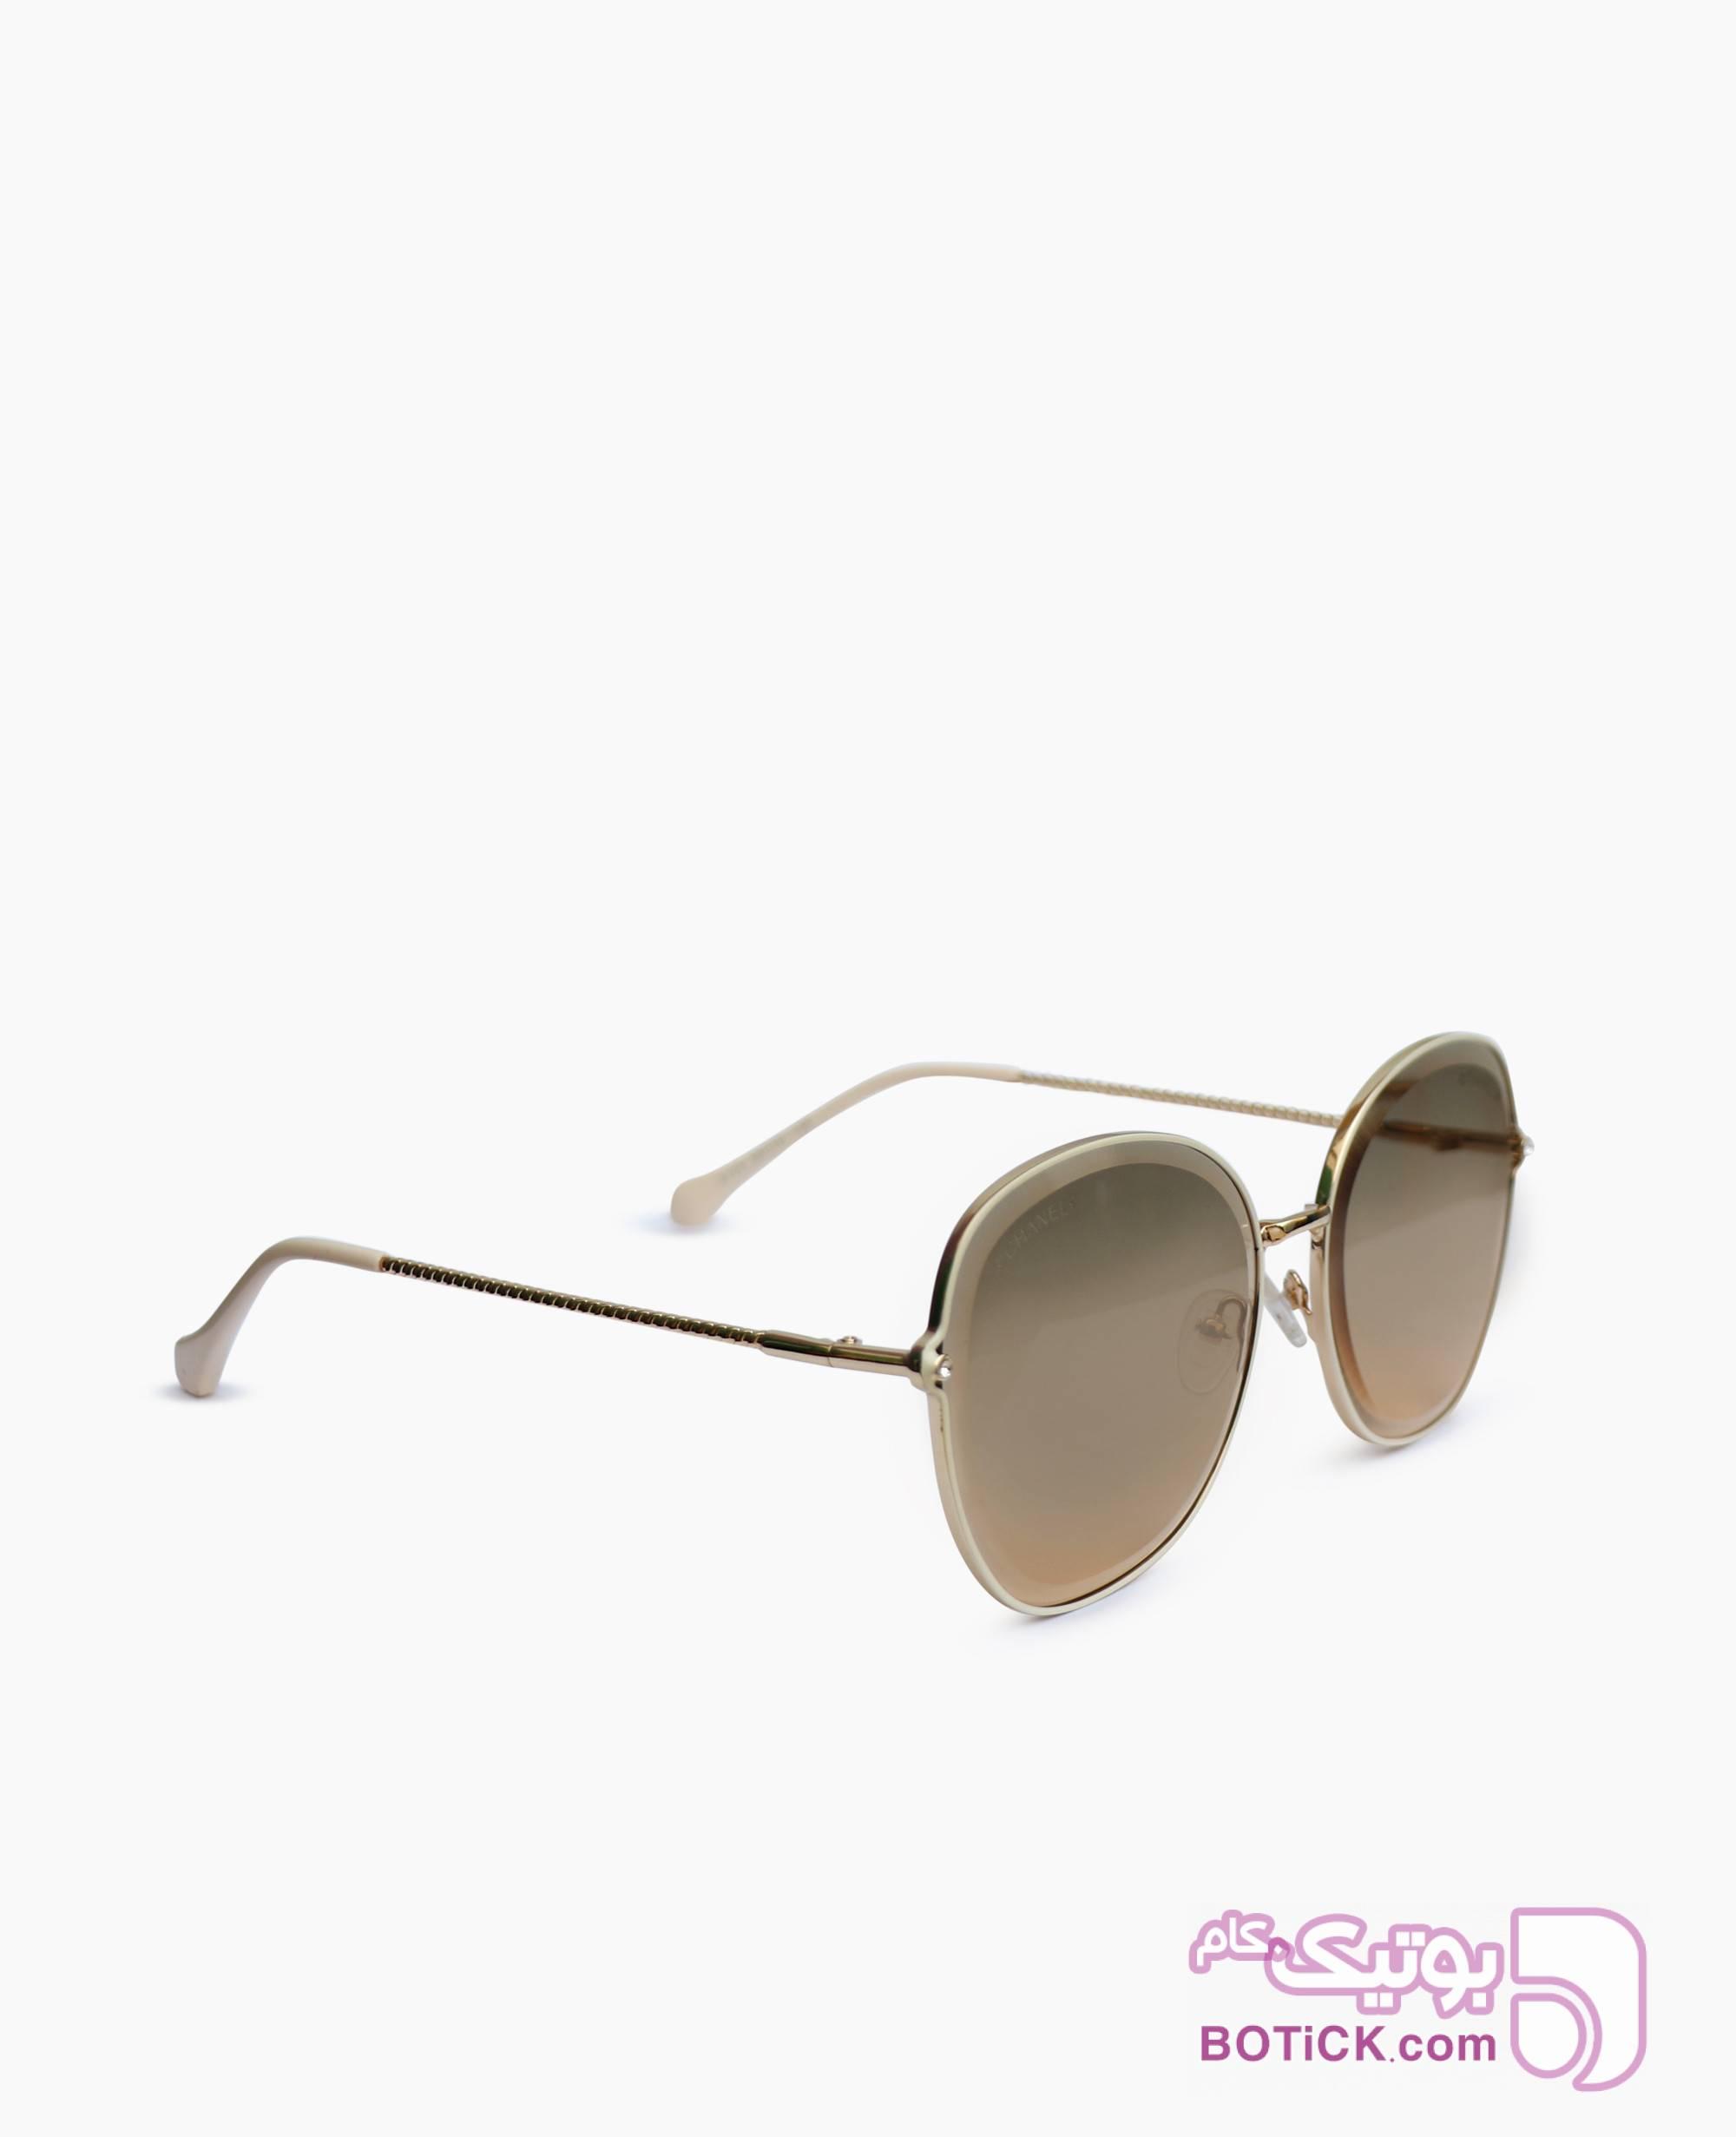 عینک آفتابی CHANEL کد 8125 آبی عینک آفتابی